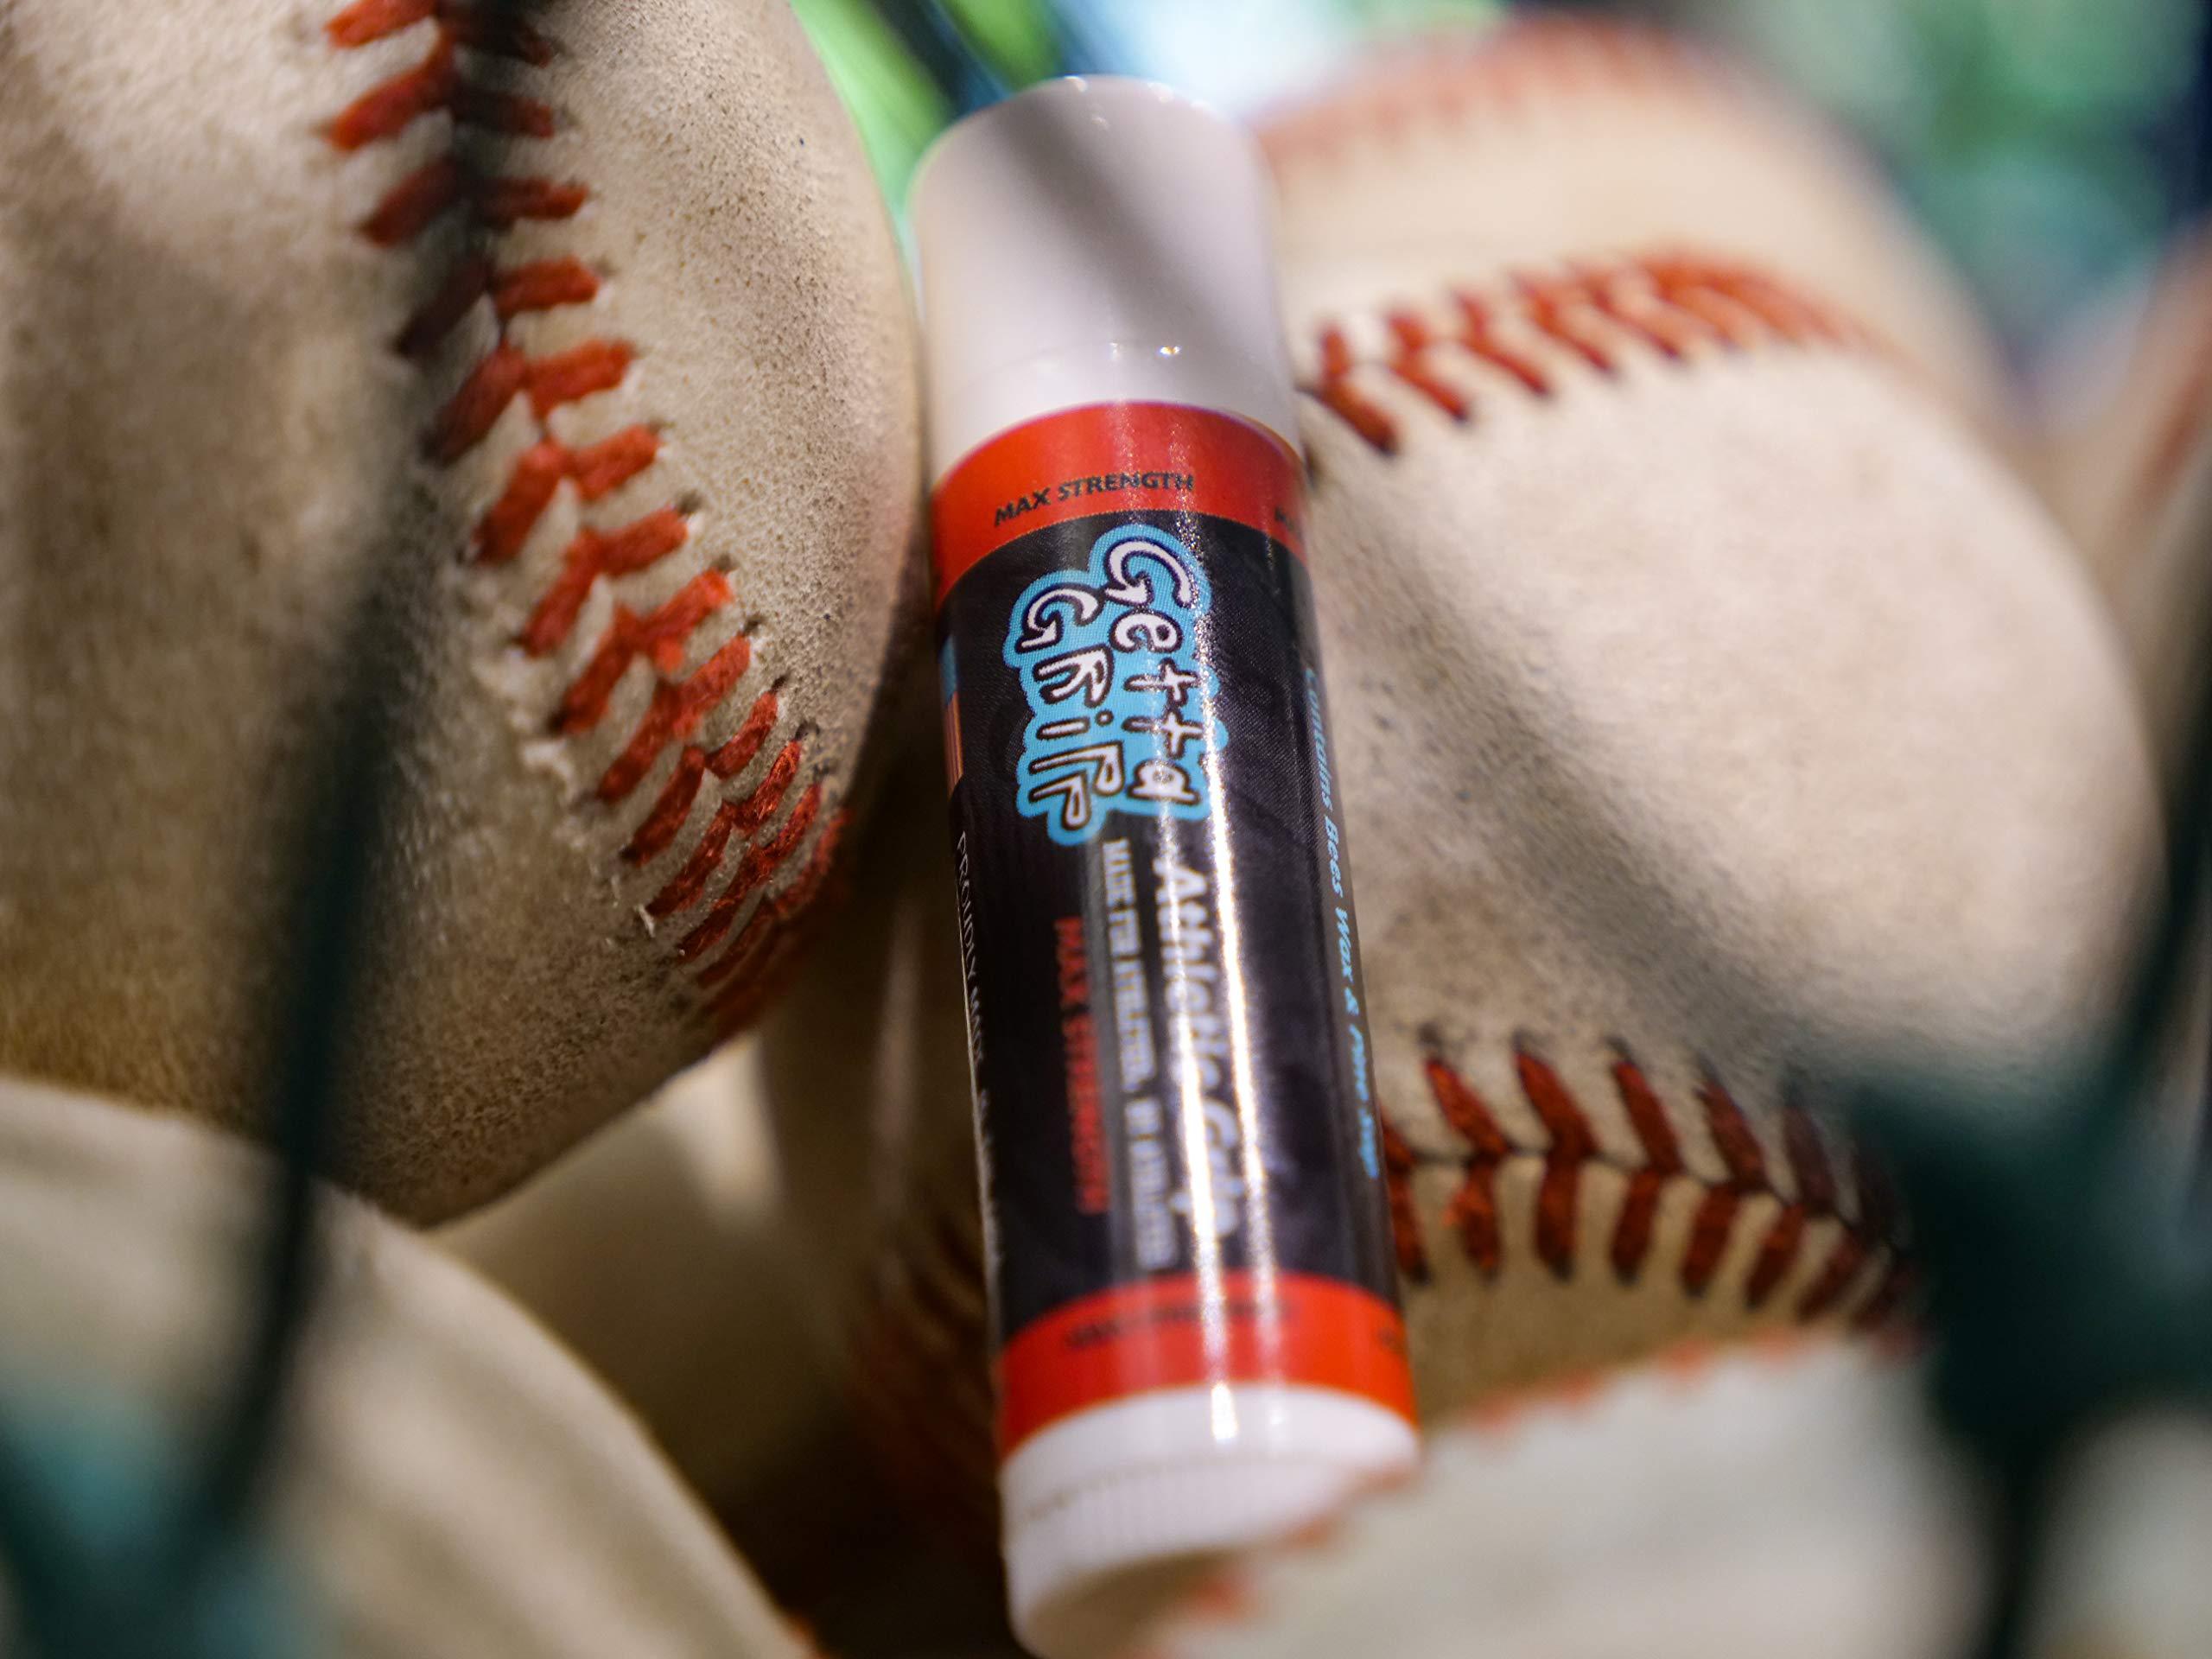 Bat Grip - Comfortable Alternative for Baseball Gloves and Pine Tar - Baseball Bat Grip and Lizard Skin Bat Grip - Baseball Bat and Softball Bat - 1 Ounce Maximum Strength by Getta Gripp